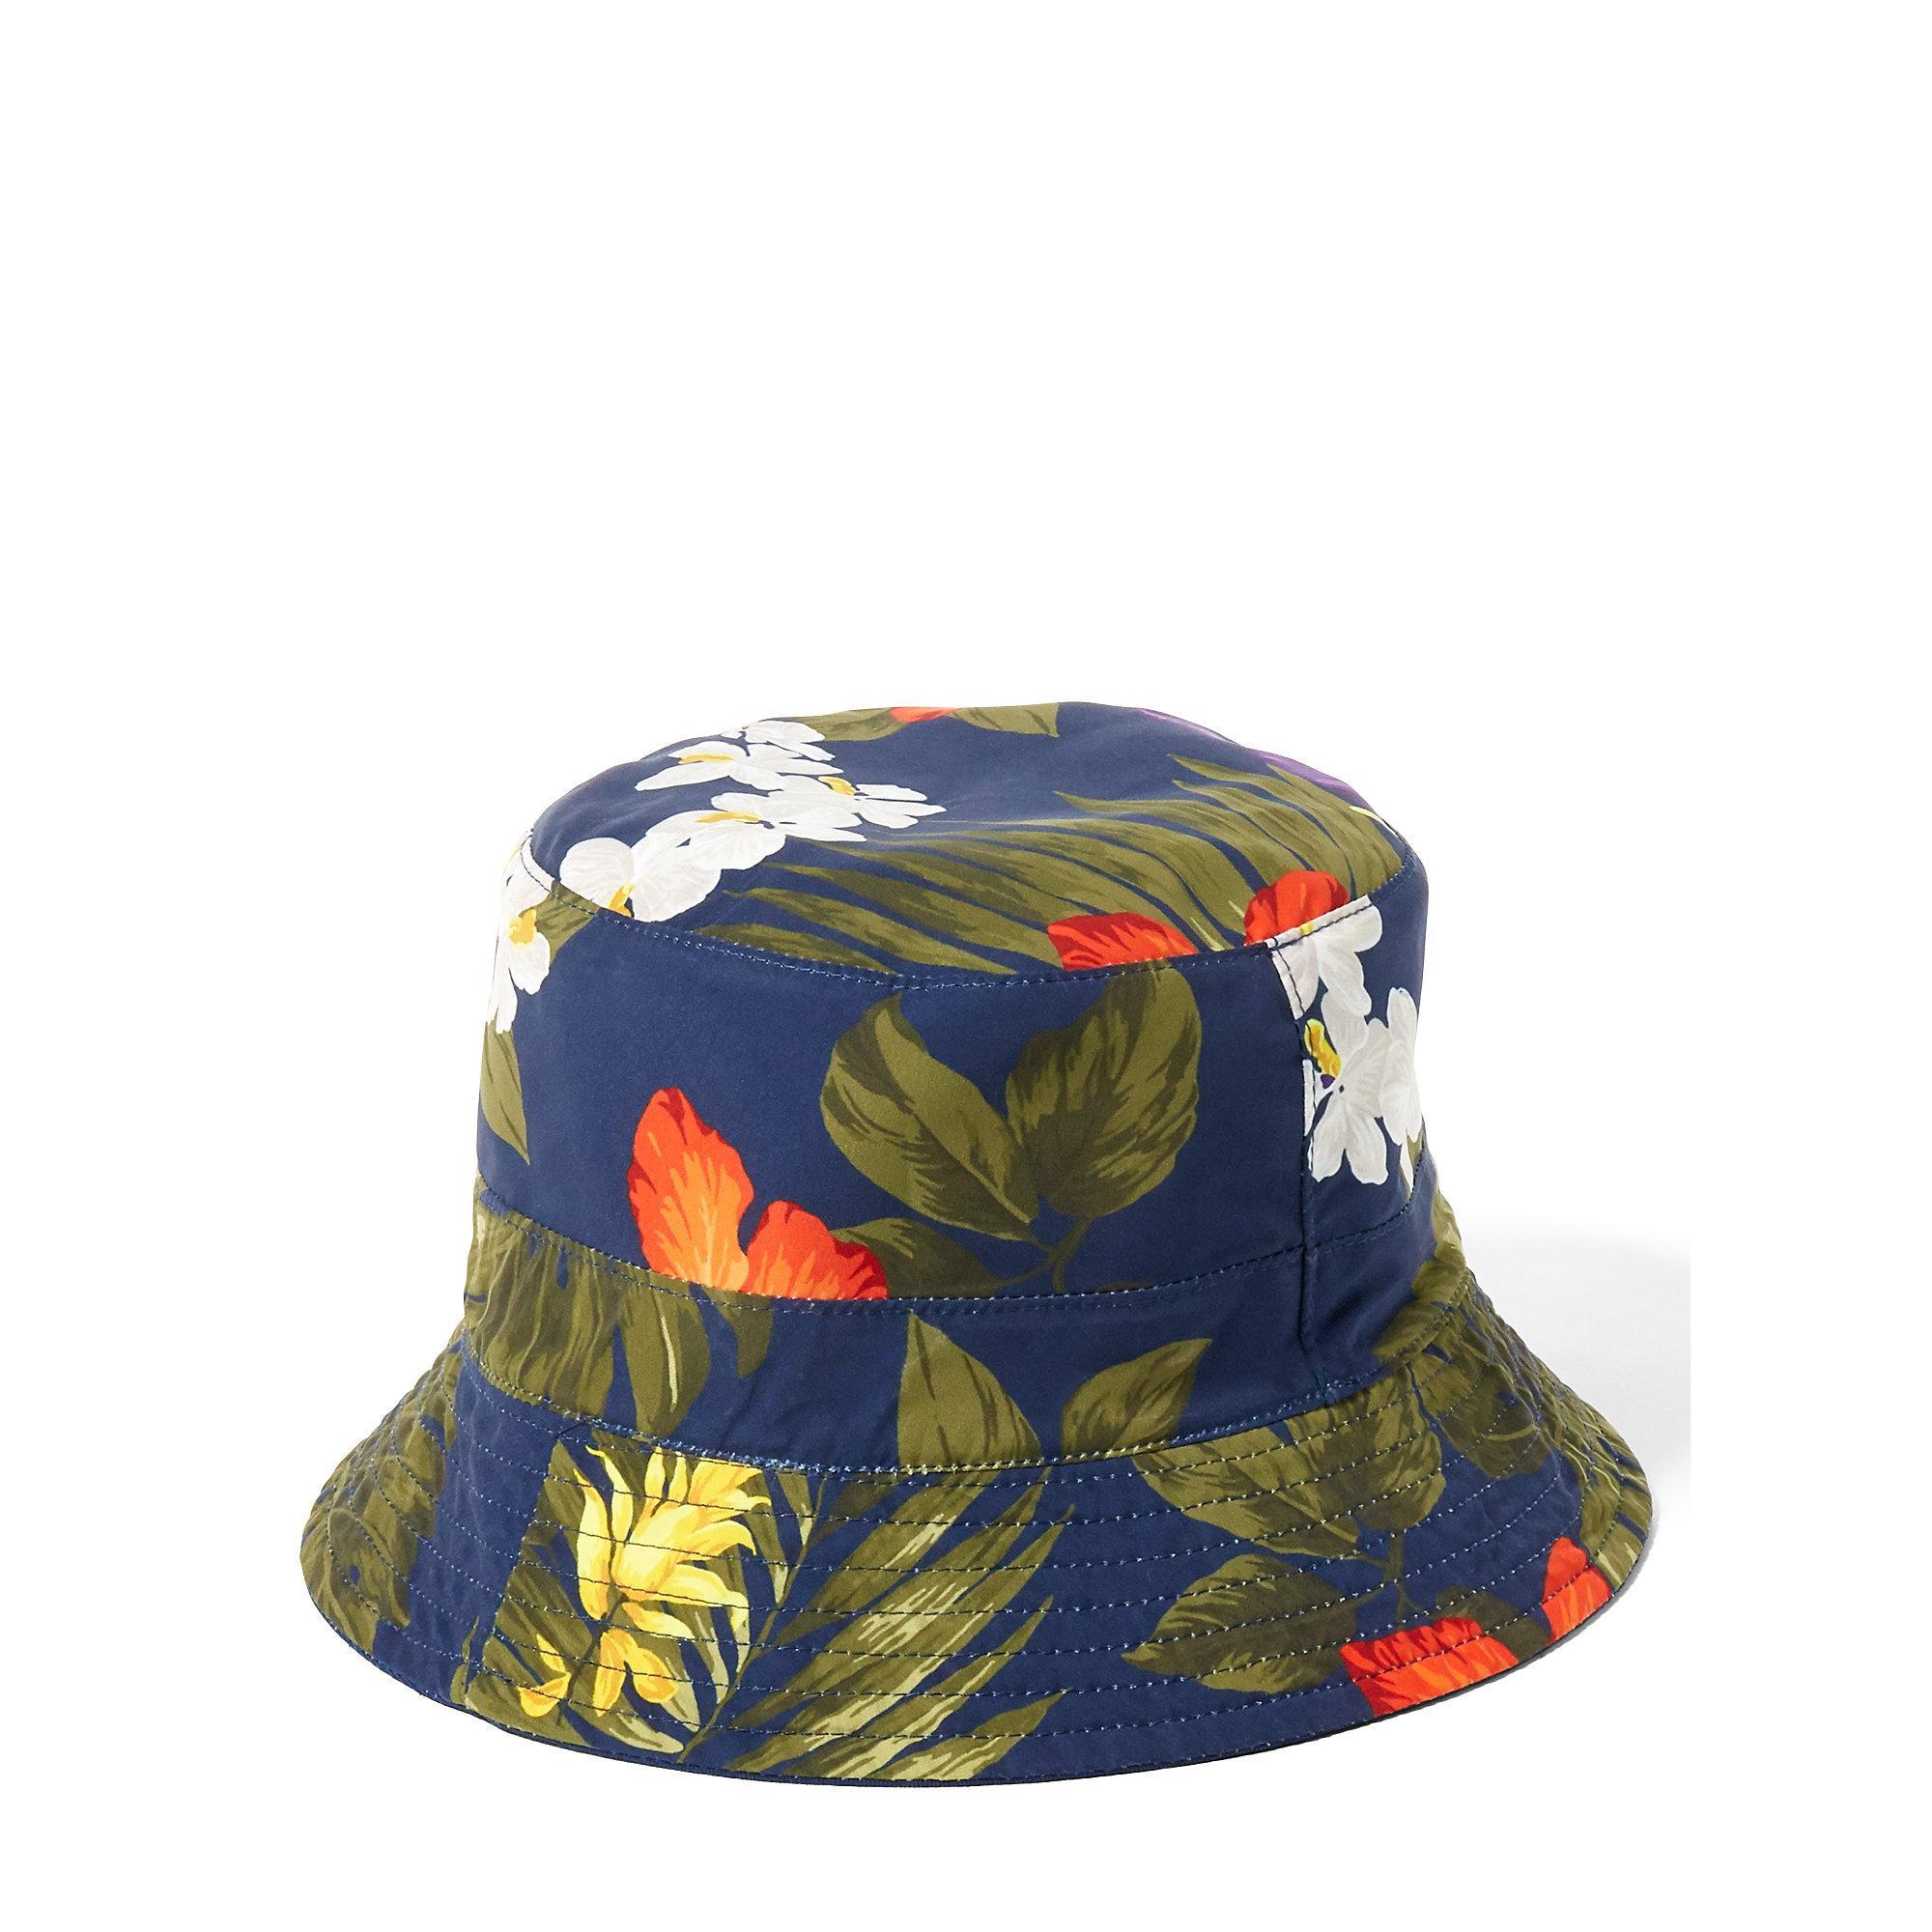 c82e1801879 ... shopping mcm bucket hat for sale virginia beach va 316d3 a1006